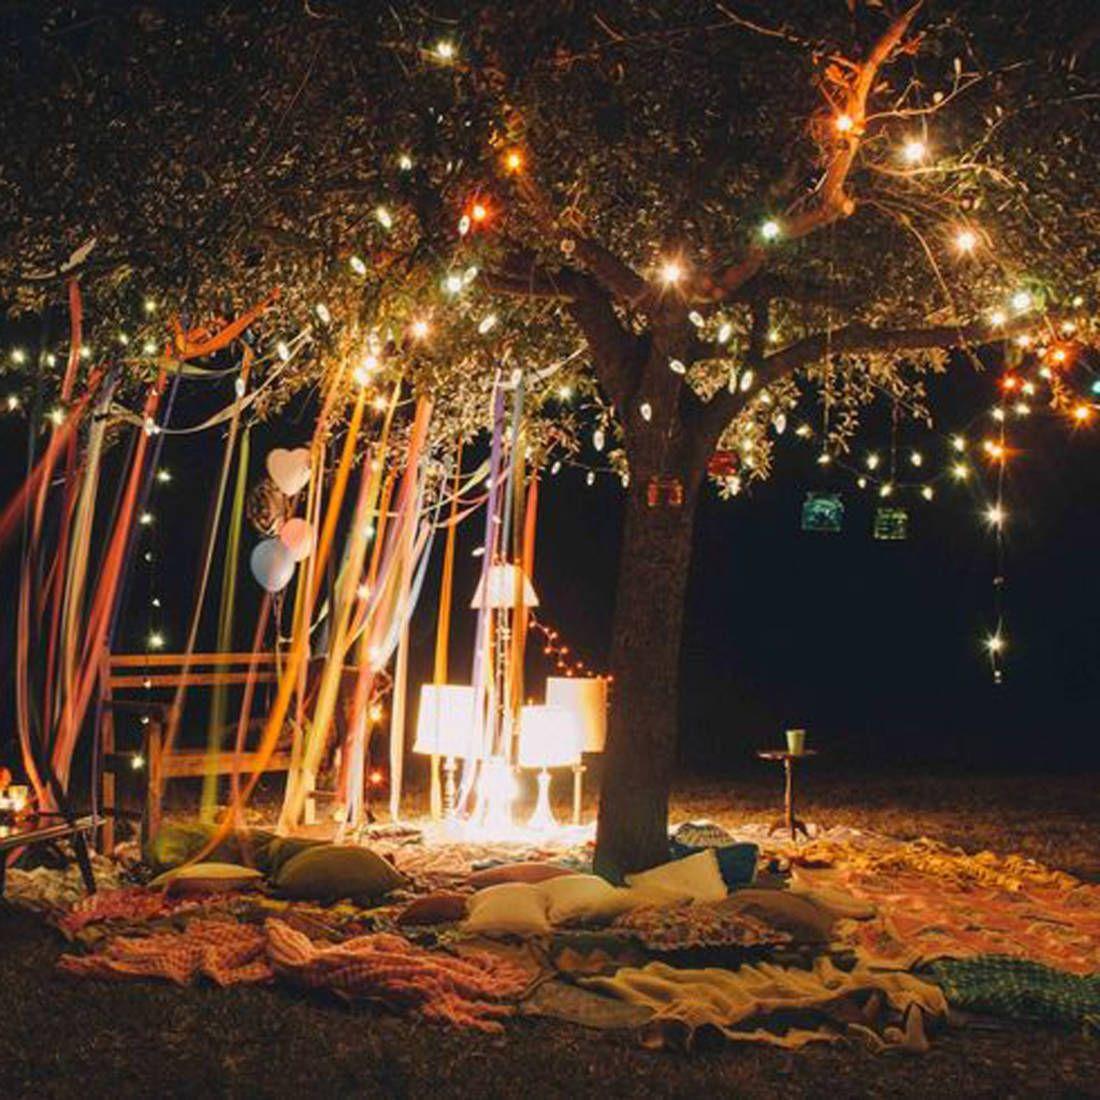 am nager son jardin fa on glamping mariage nomade chic pinterest. Black Bedroom Furniture Sets. Home Design Ideas